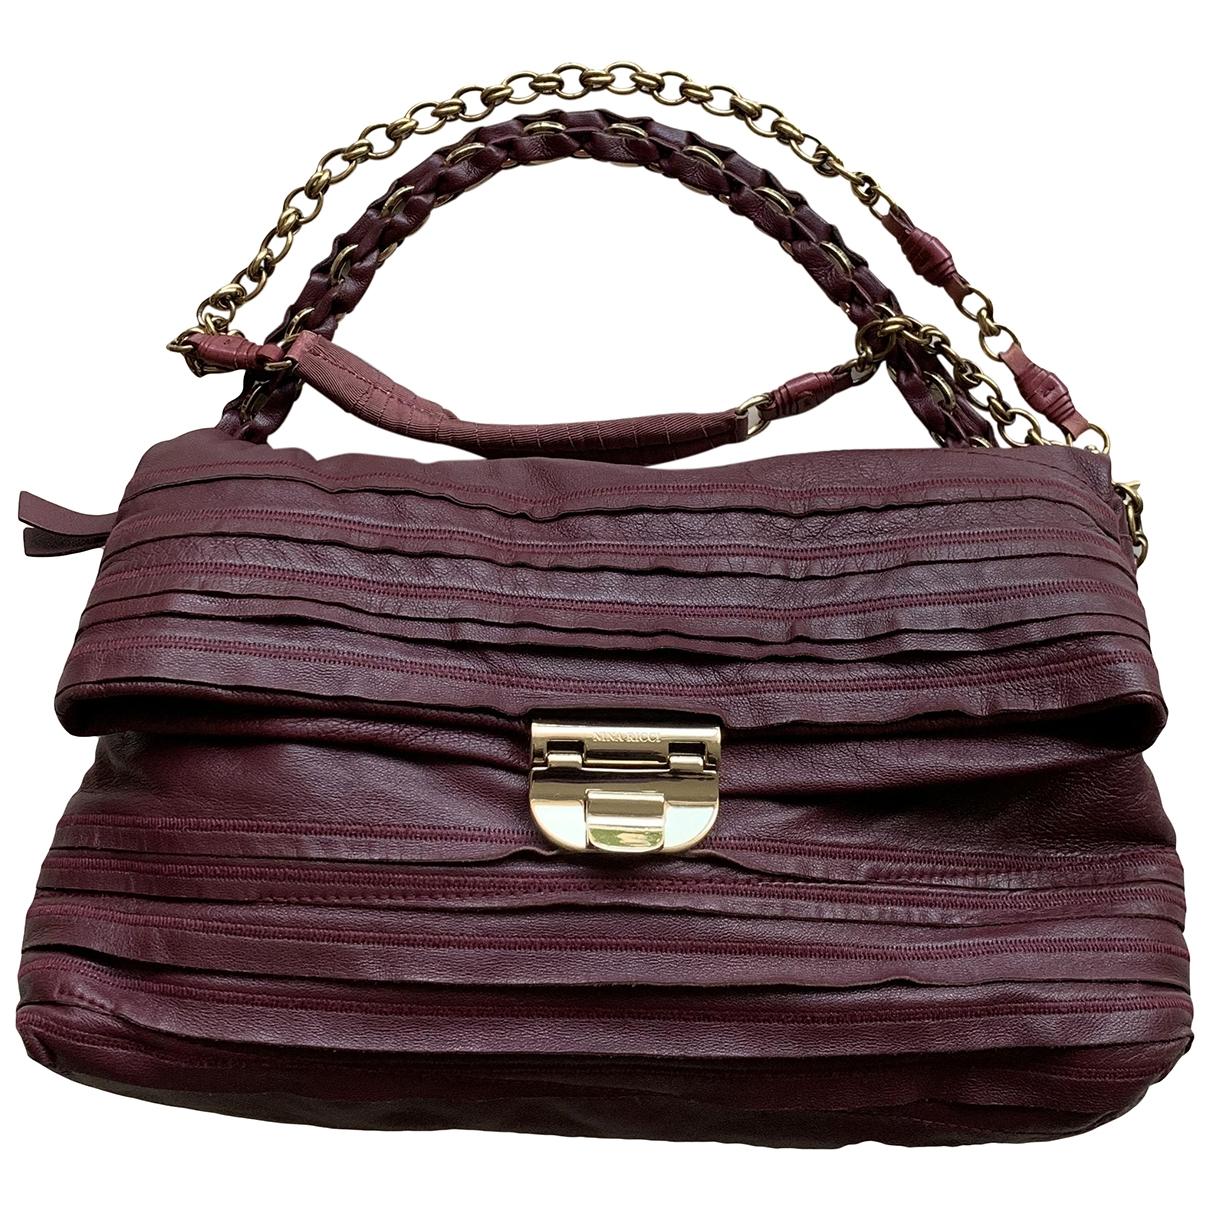 Nina Ricci \N Burgundy Leather handbag for Women \N